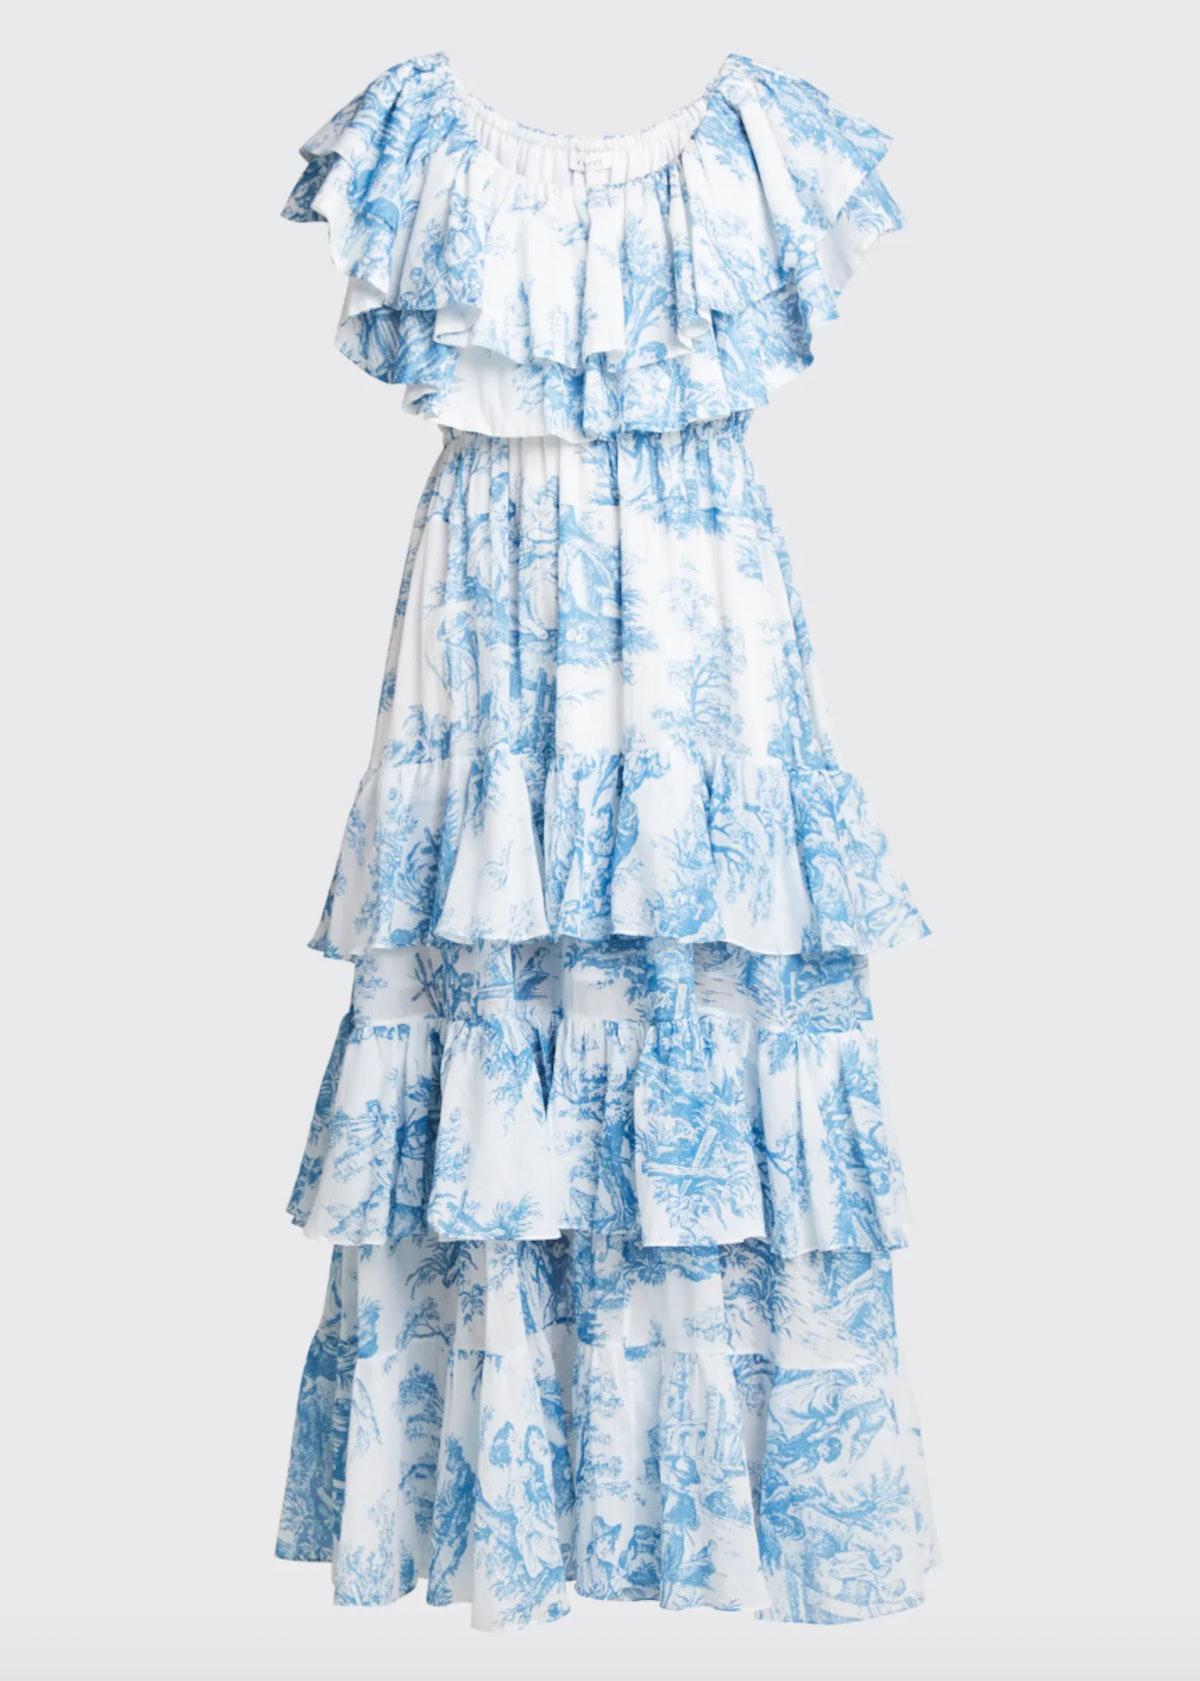 Ash Toile-Print Off-Shoulder Ruffle Dress